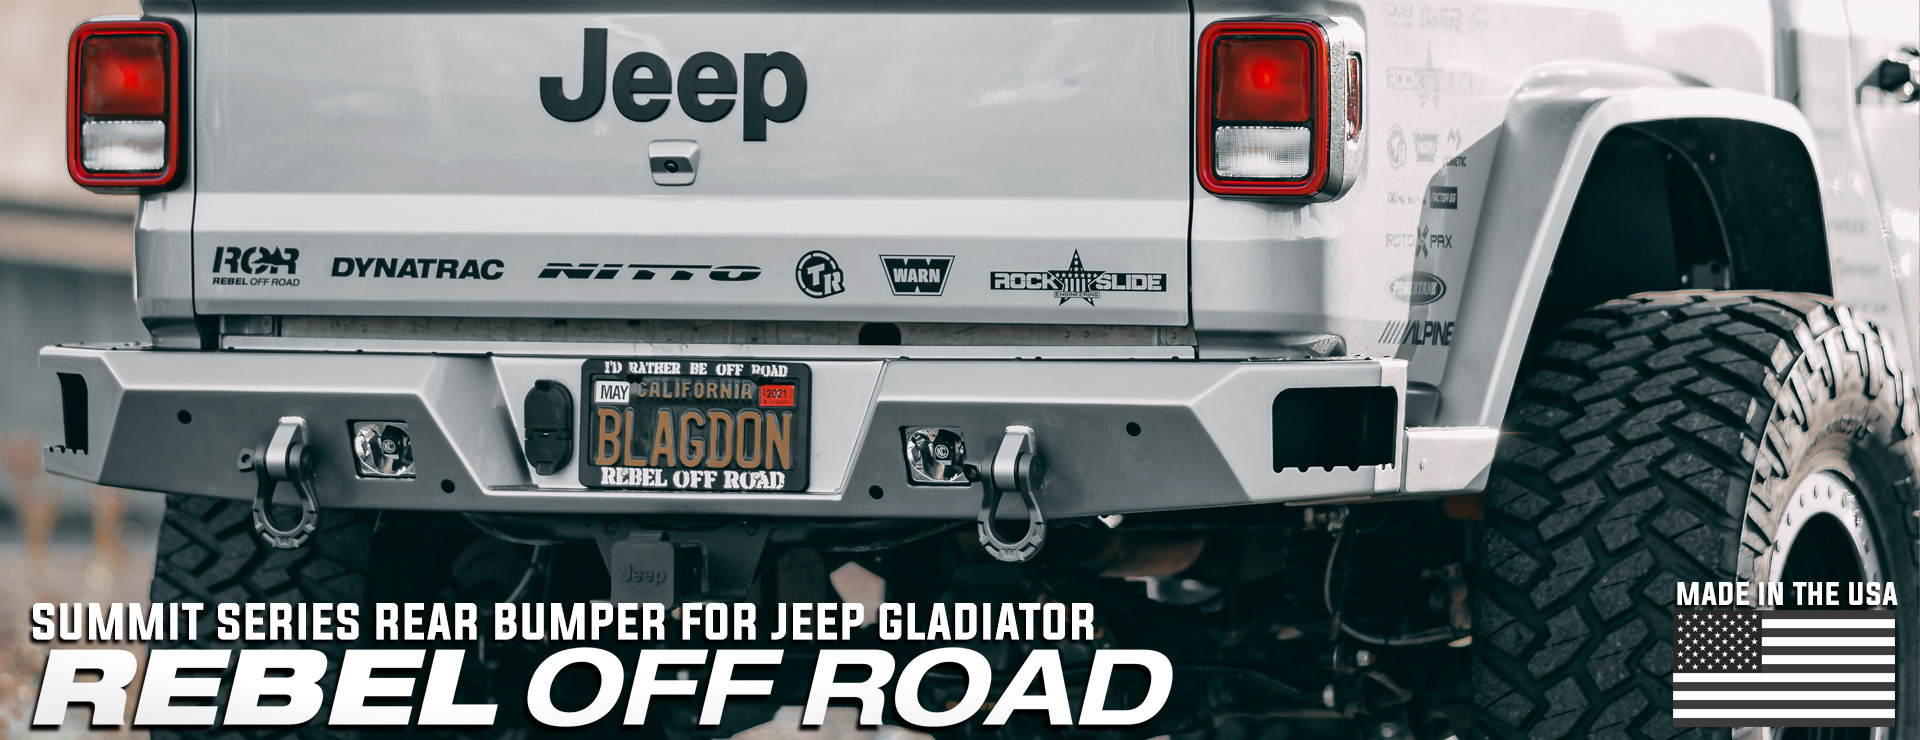 gladiator-rear-bumper-banner-web.jpg